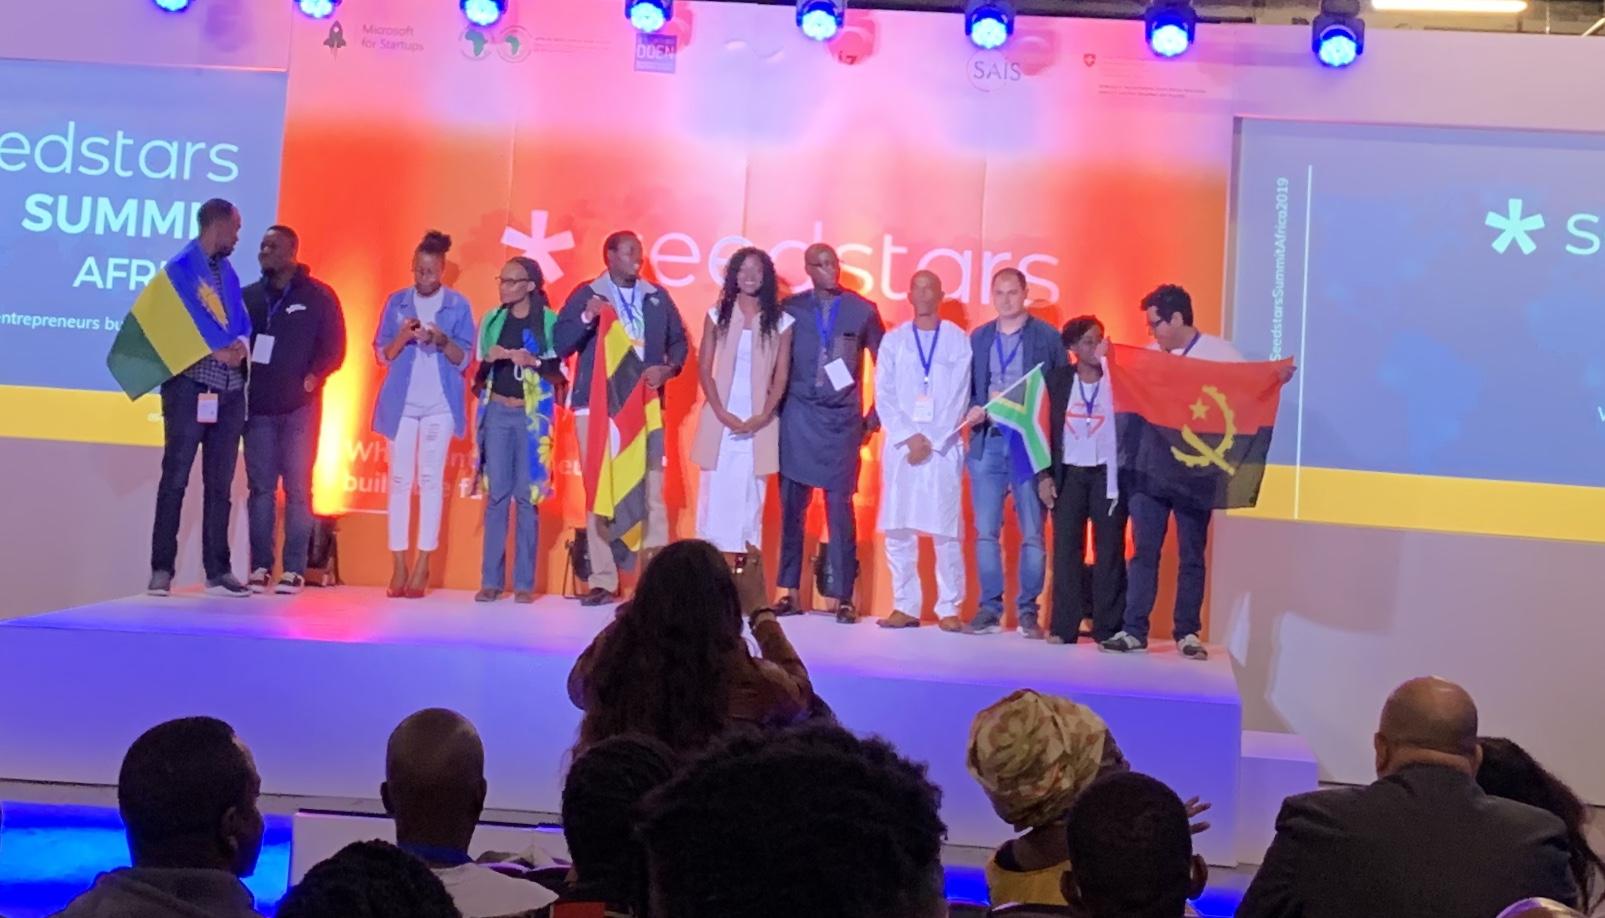 Seedstars Summit Africa 2019